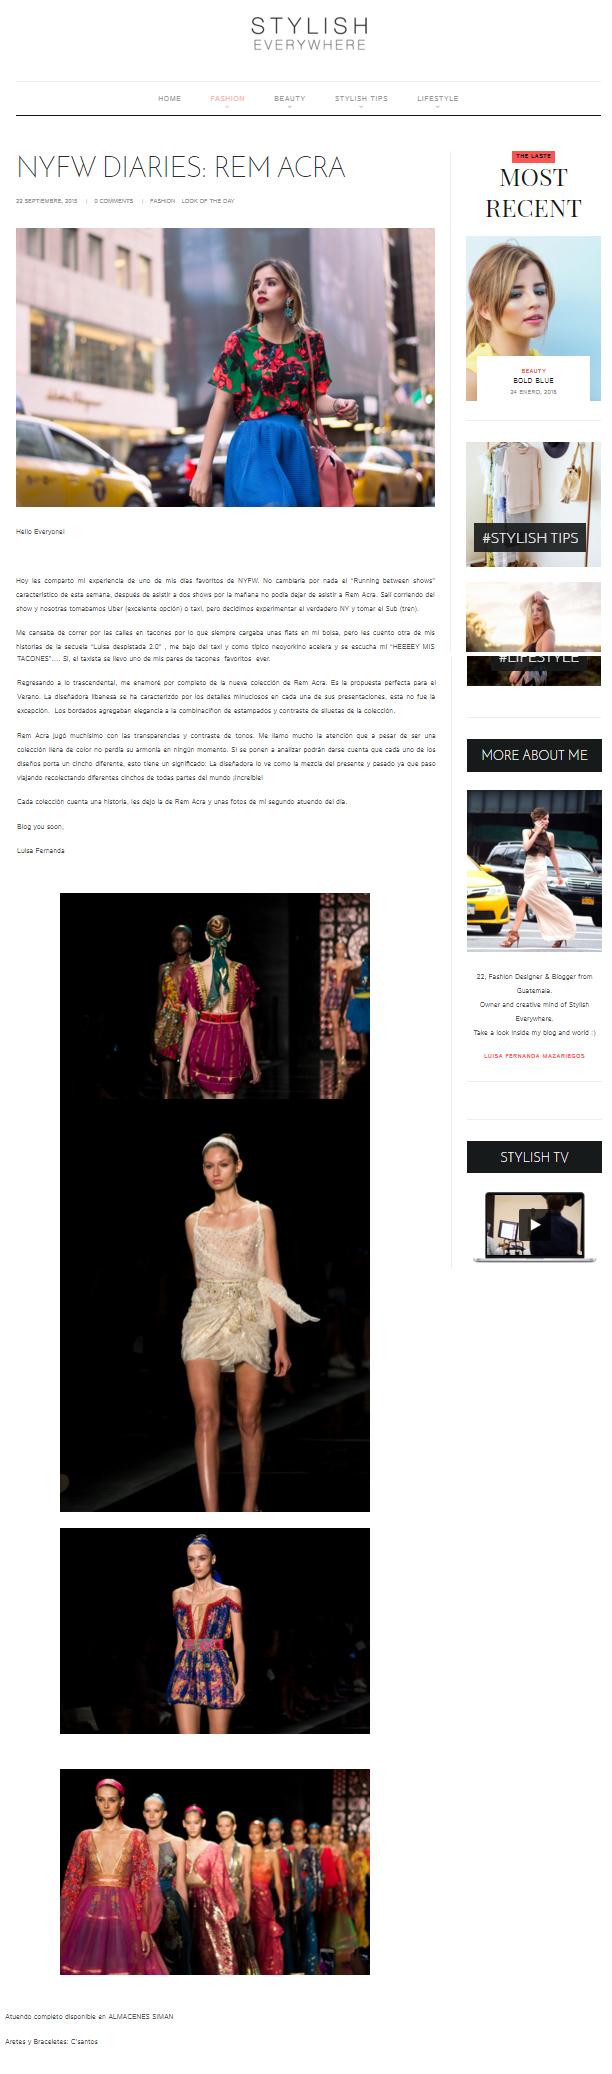 reem acra_ stylish everywhere.jpg